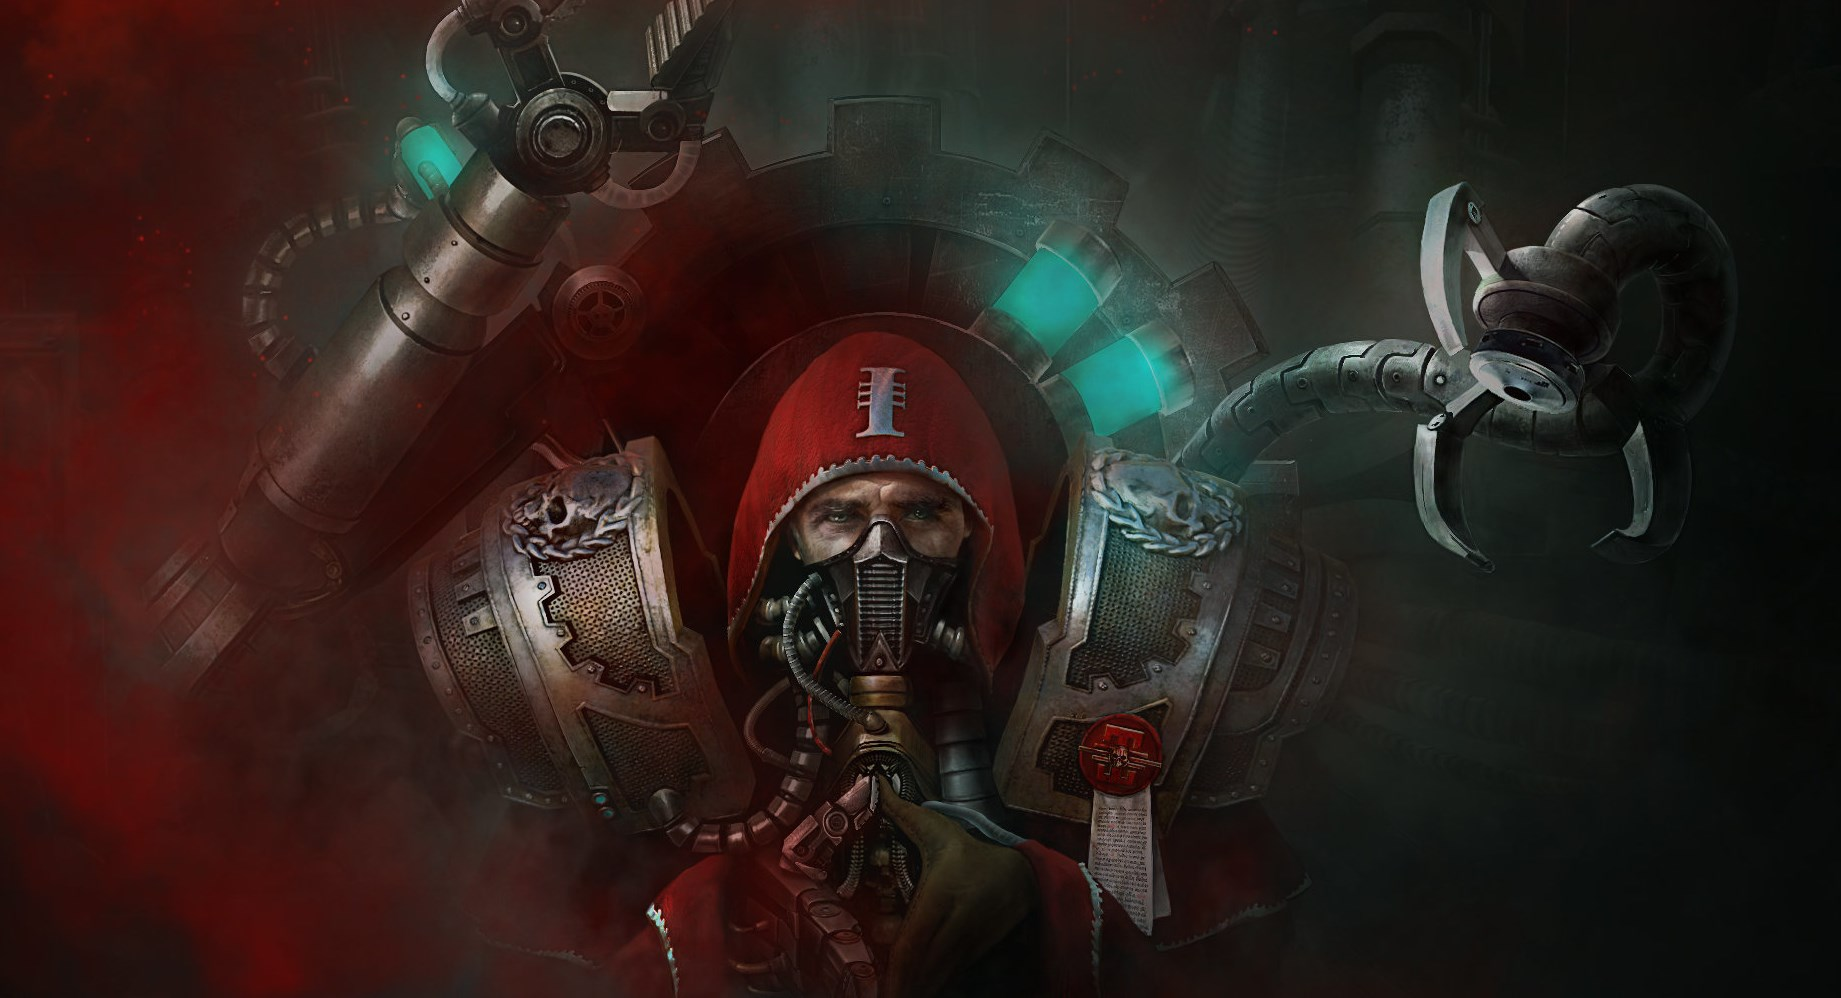 https://blog cyberpowerpc com/2019/09/04/dragon-oracle-udyr